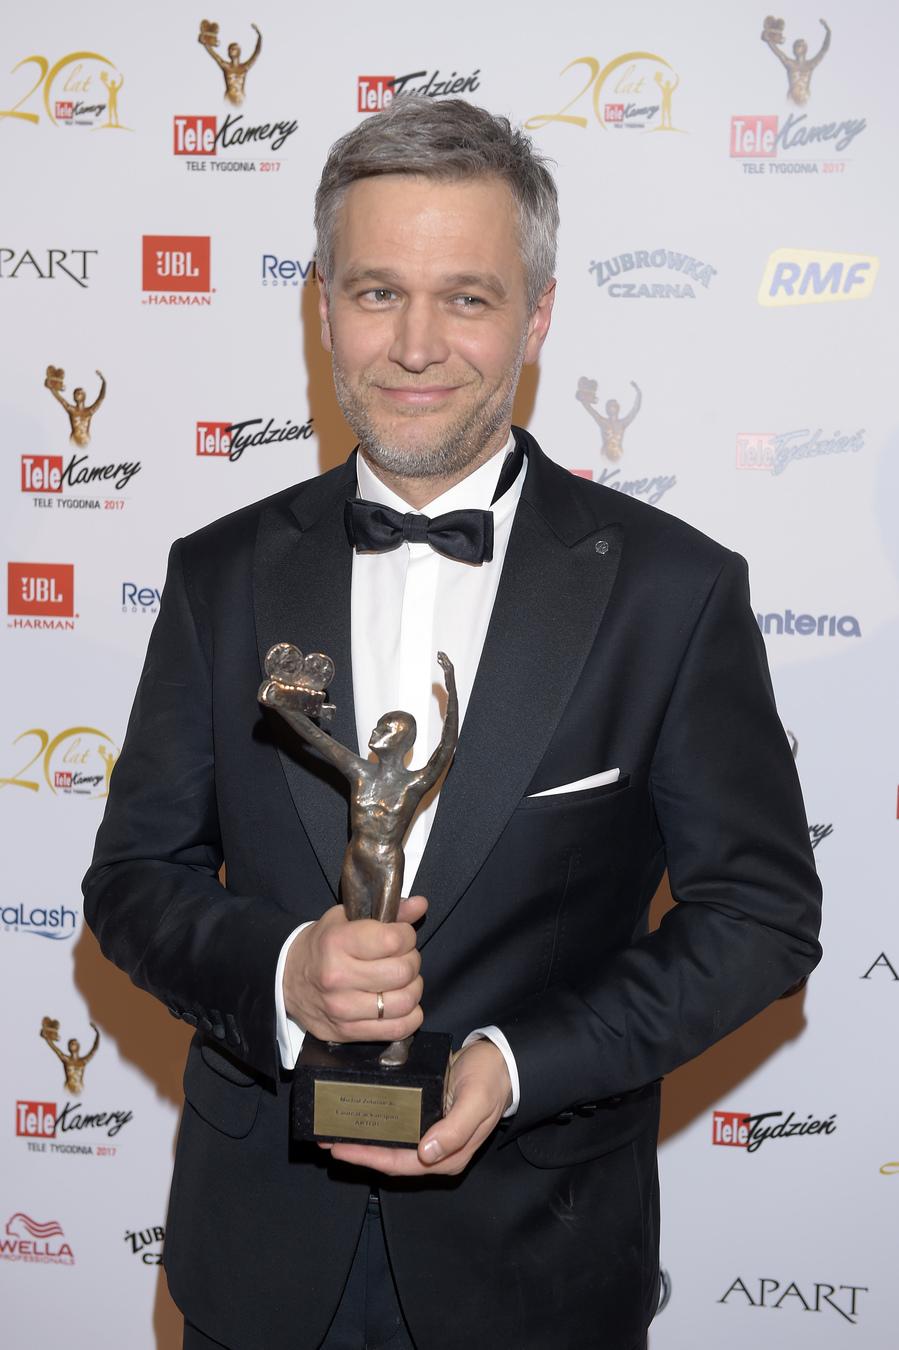 Telekamery 2017: Michał Żebrowski